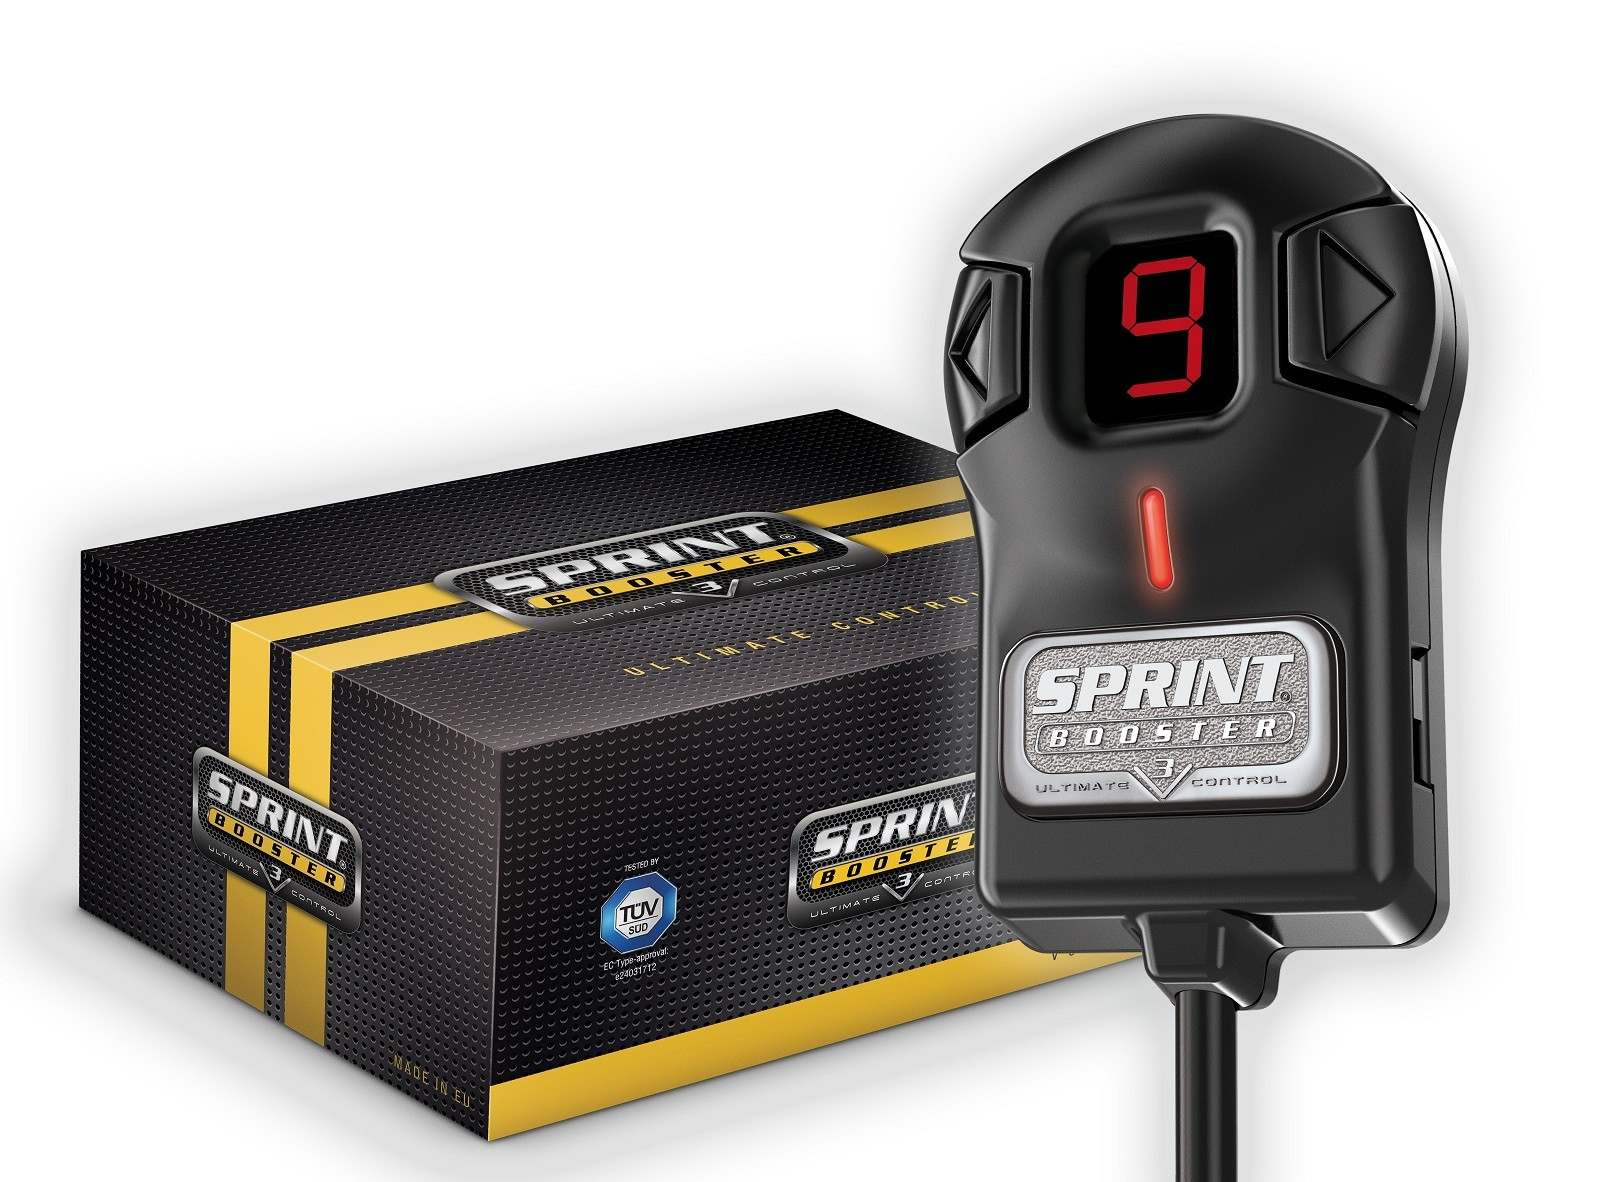 SprintBooster SBHO0003S Performance Upgrade Power Converter Sprint Booster